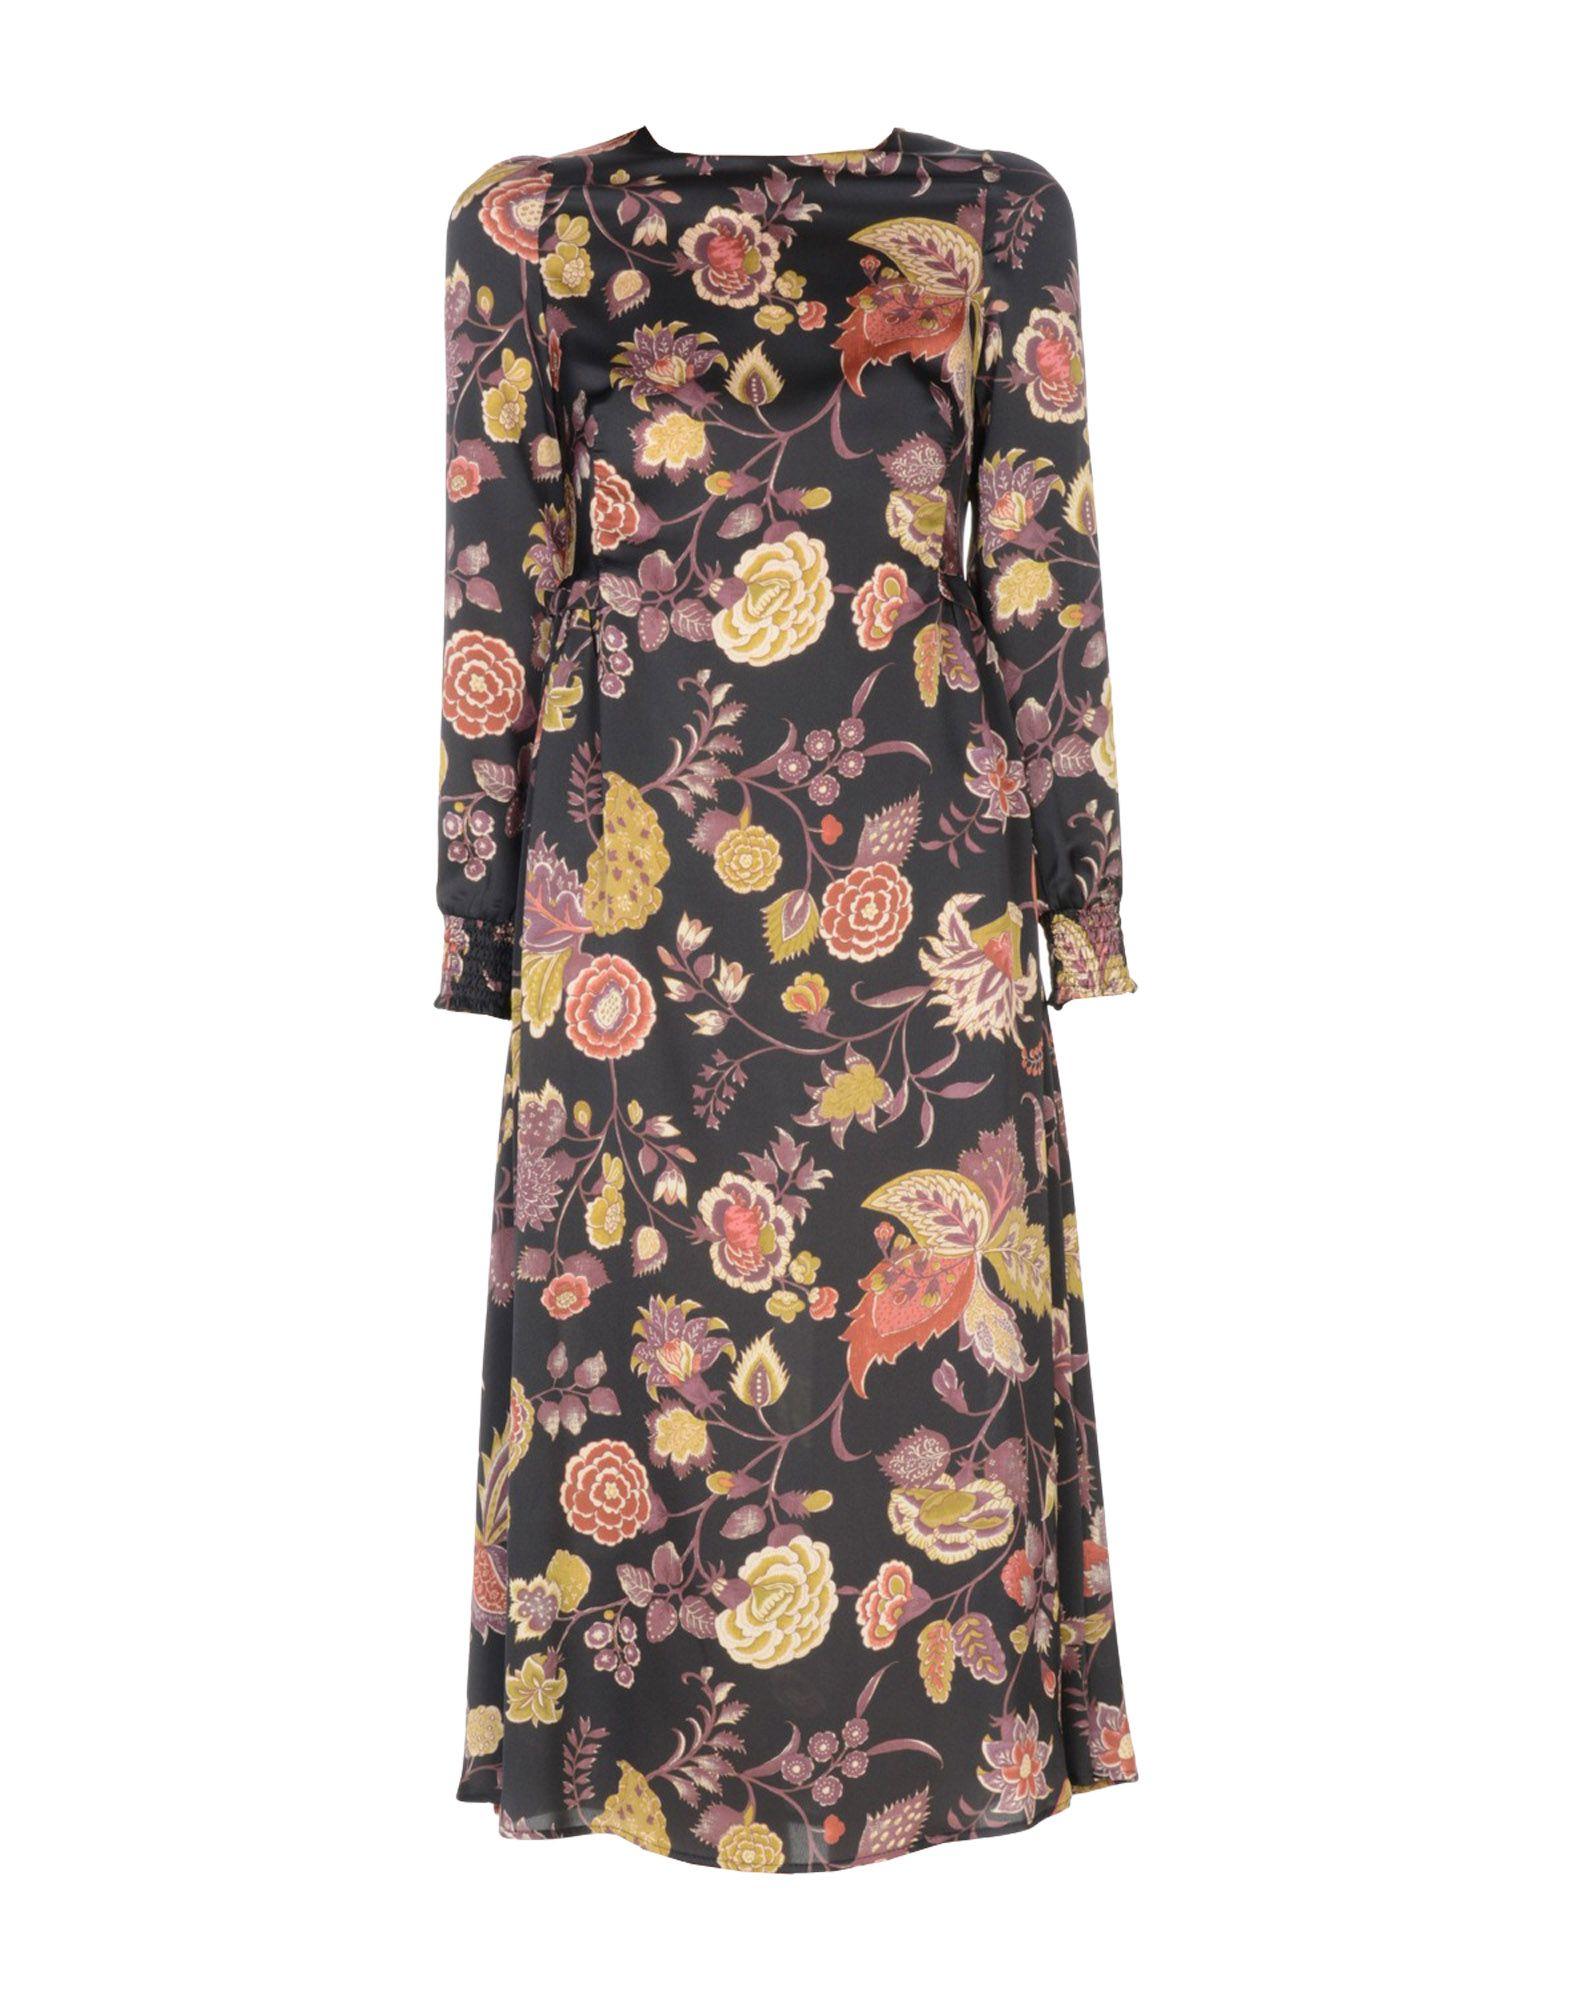 BIANCOGHIACCIO Платье длиной 3/4 lisa corti платье длиной 3 4